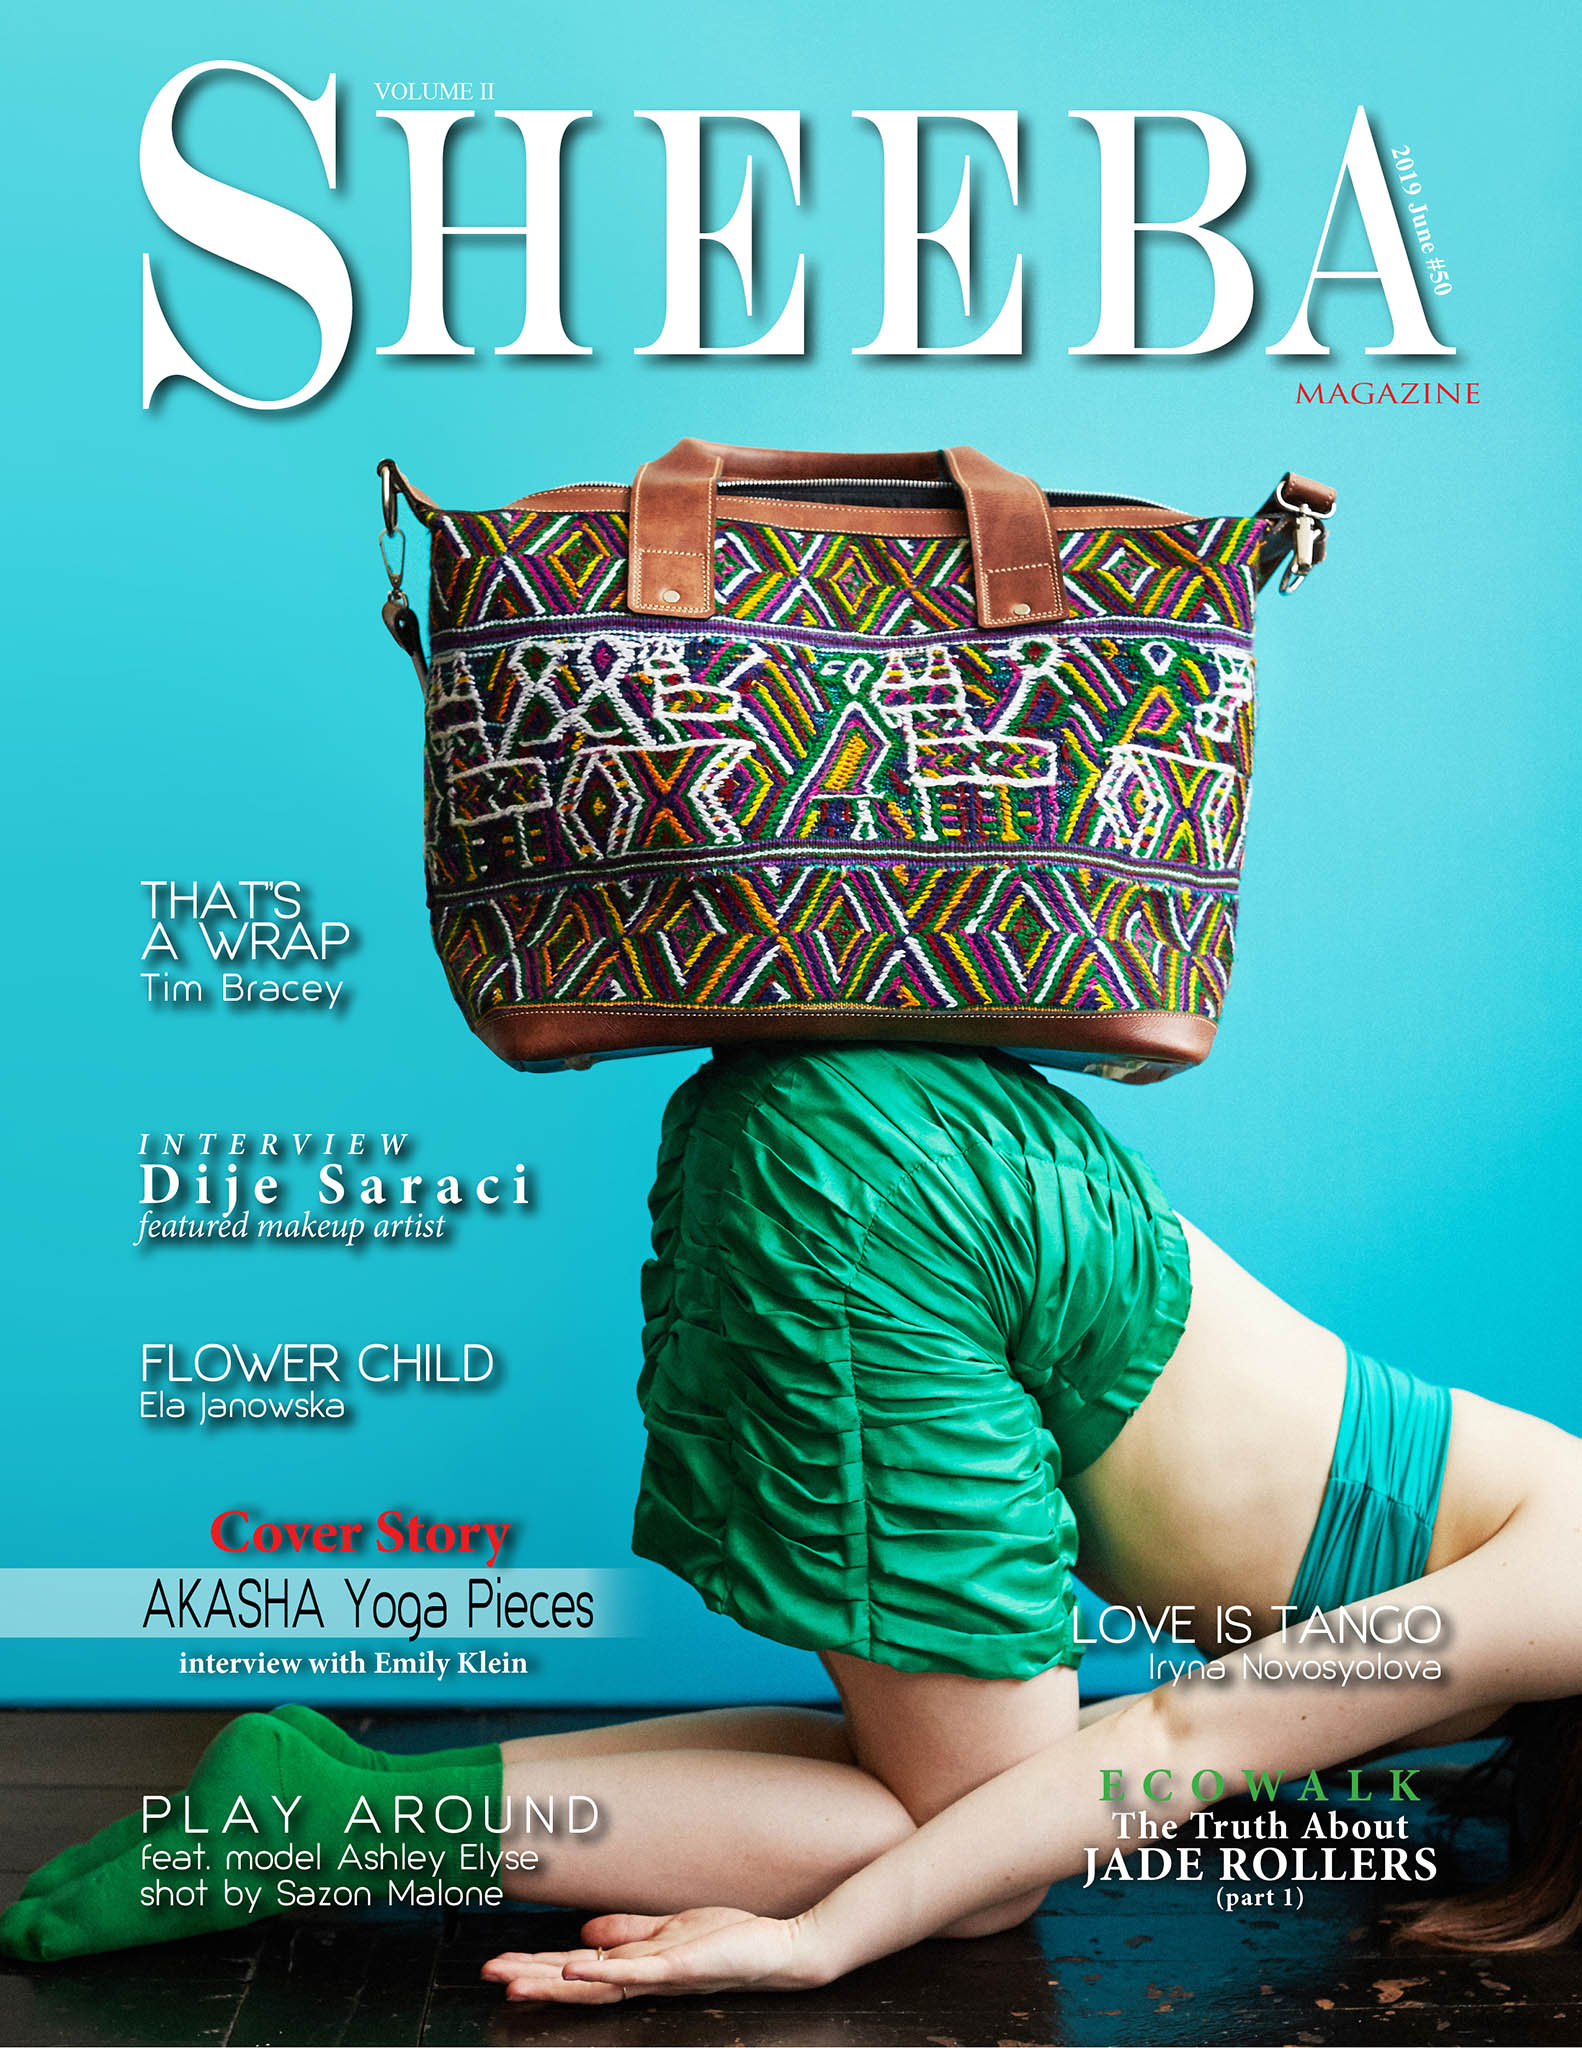 2019 #50 Sheeba June VOL II COVER web.jpg